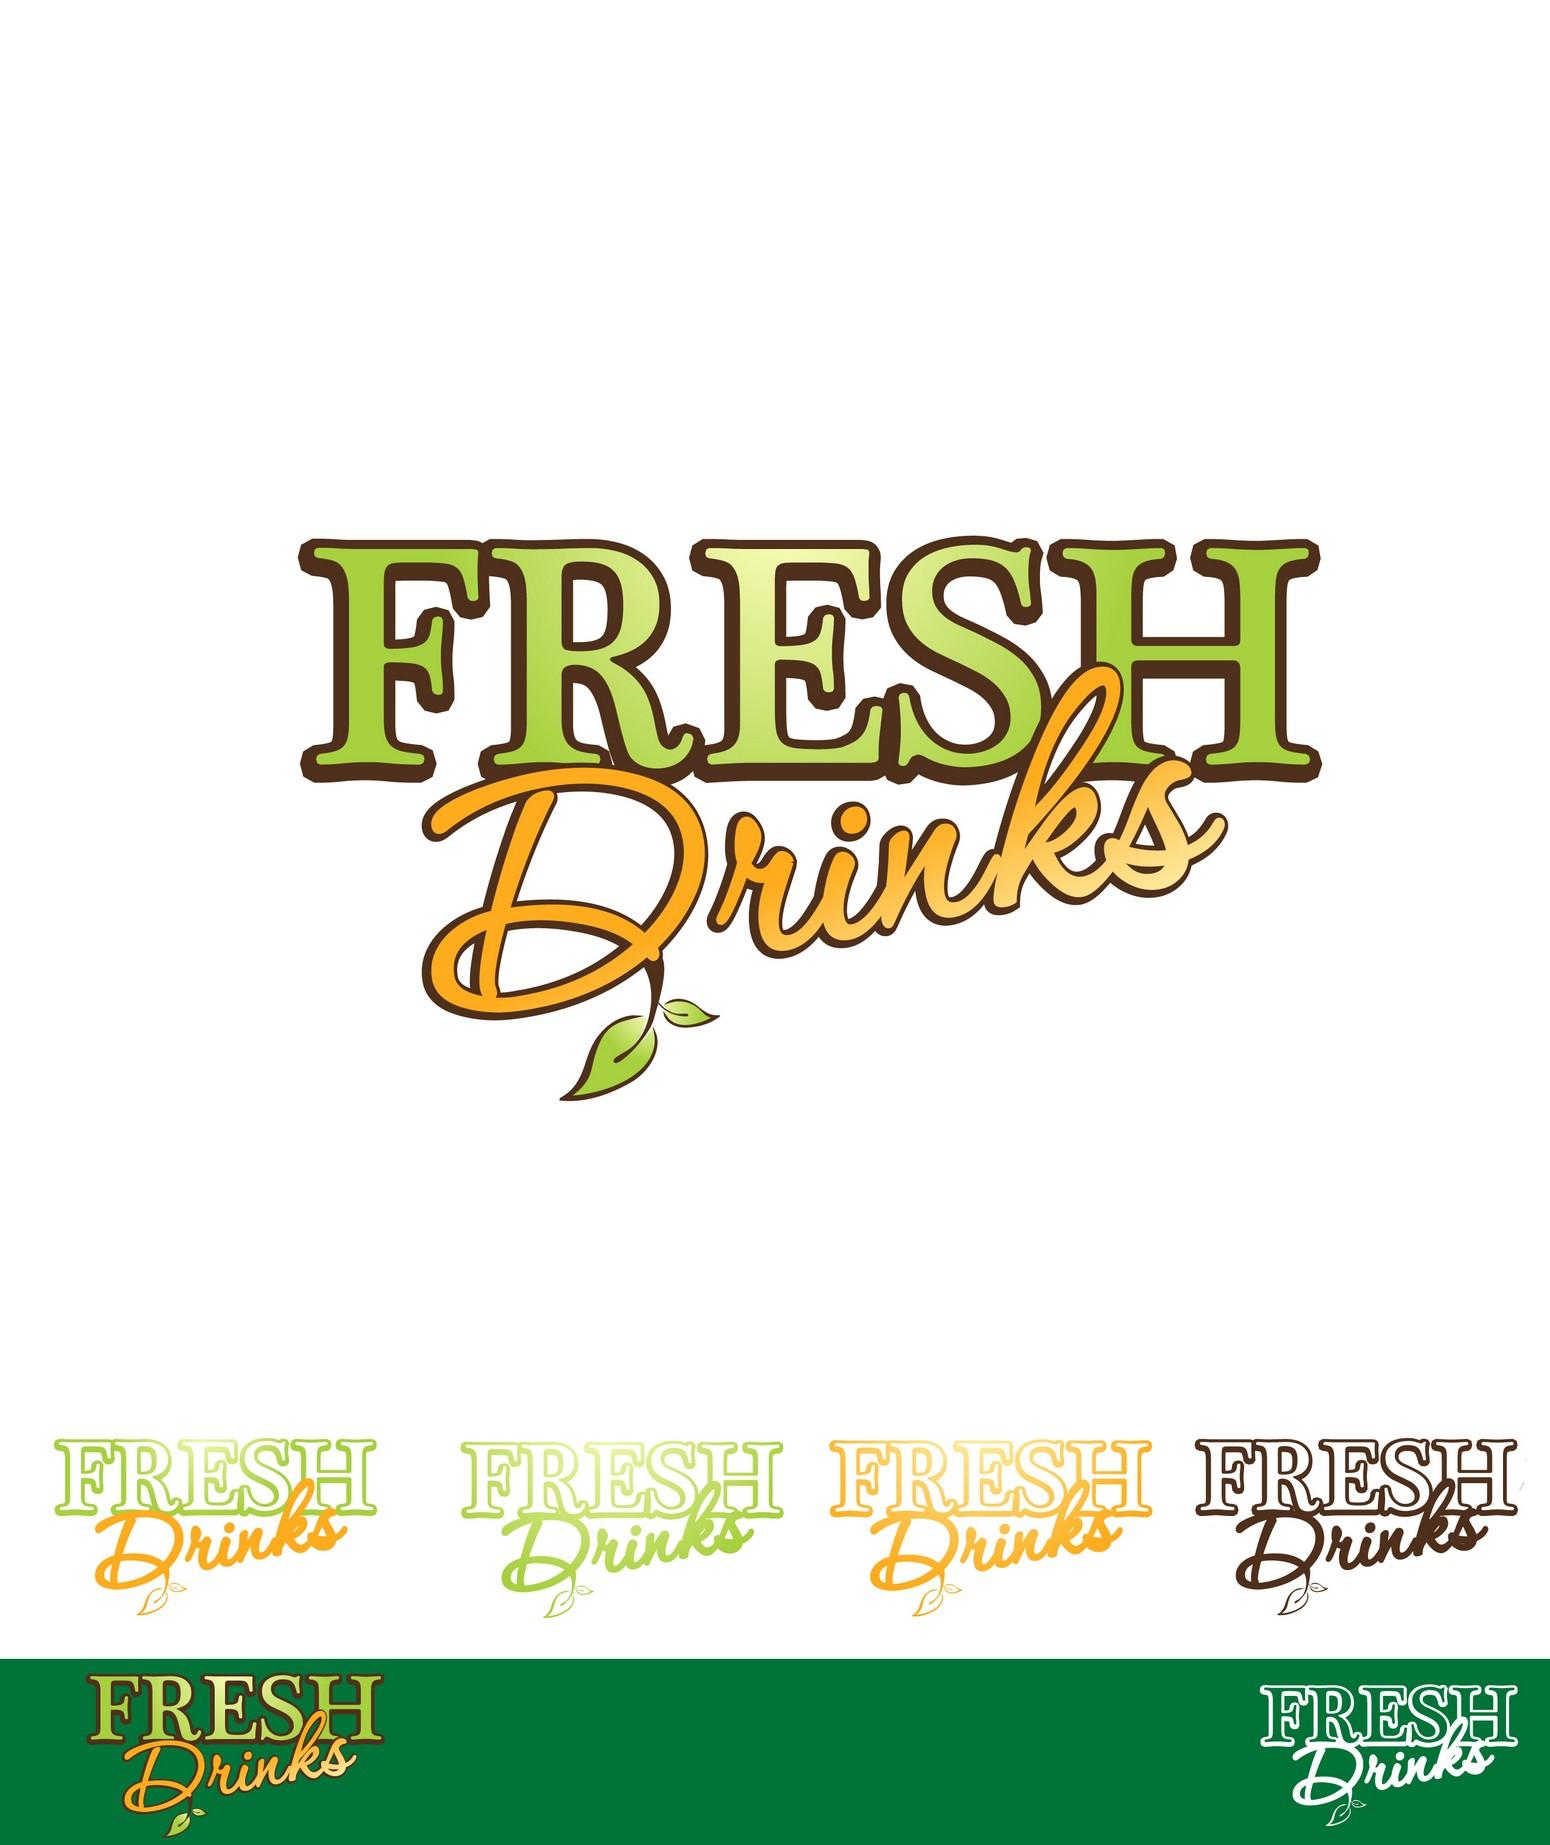 Fresh Drinks needs a new logo